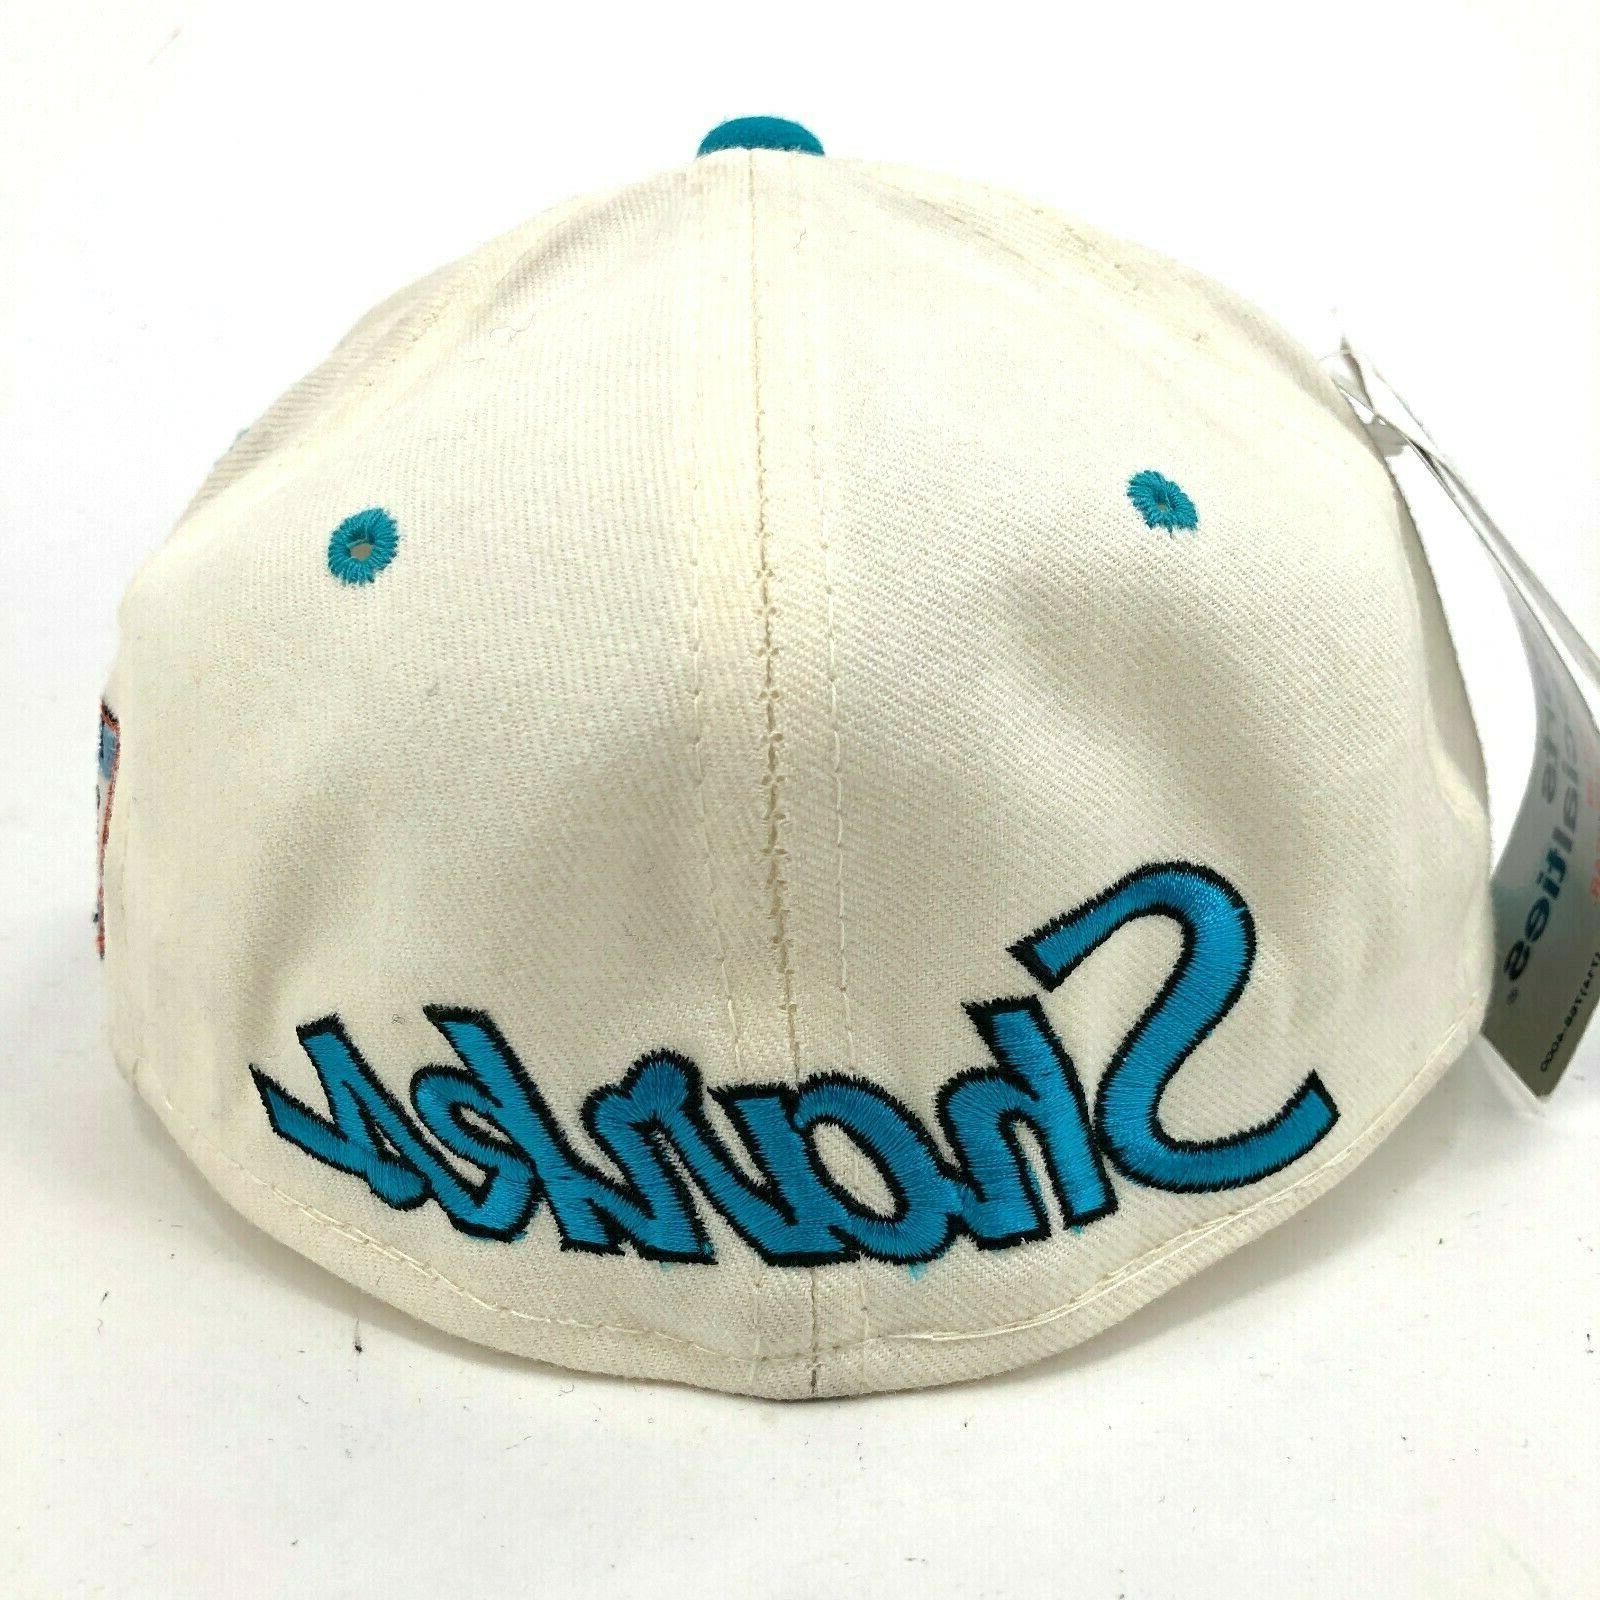 Vintage San Sports Specialties Hat Shark